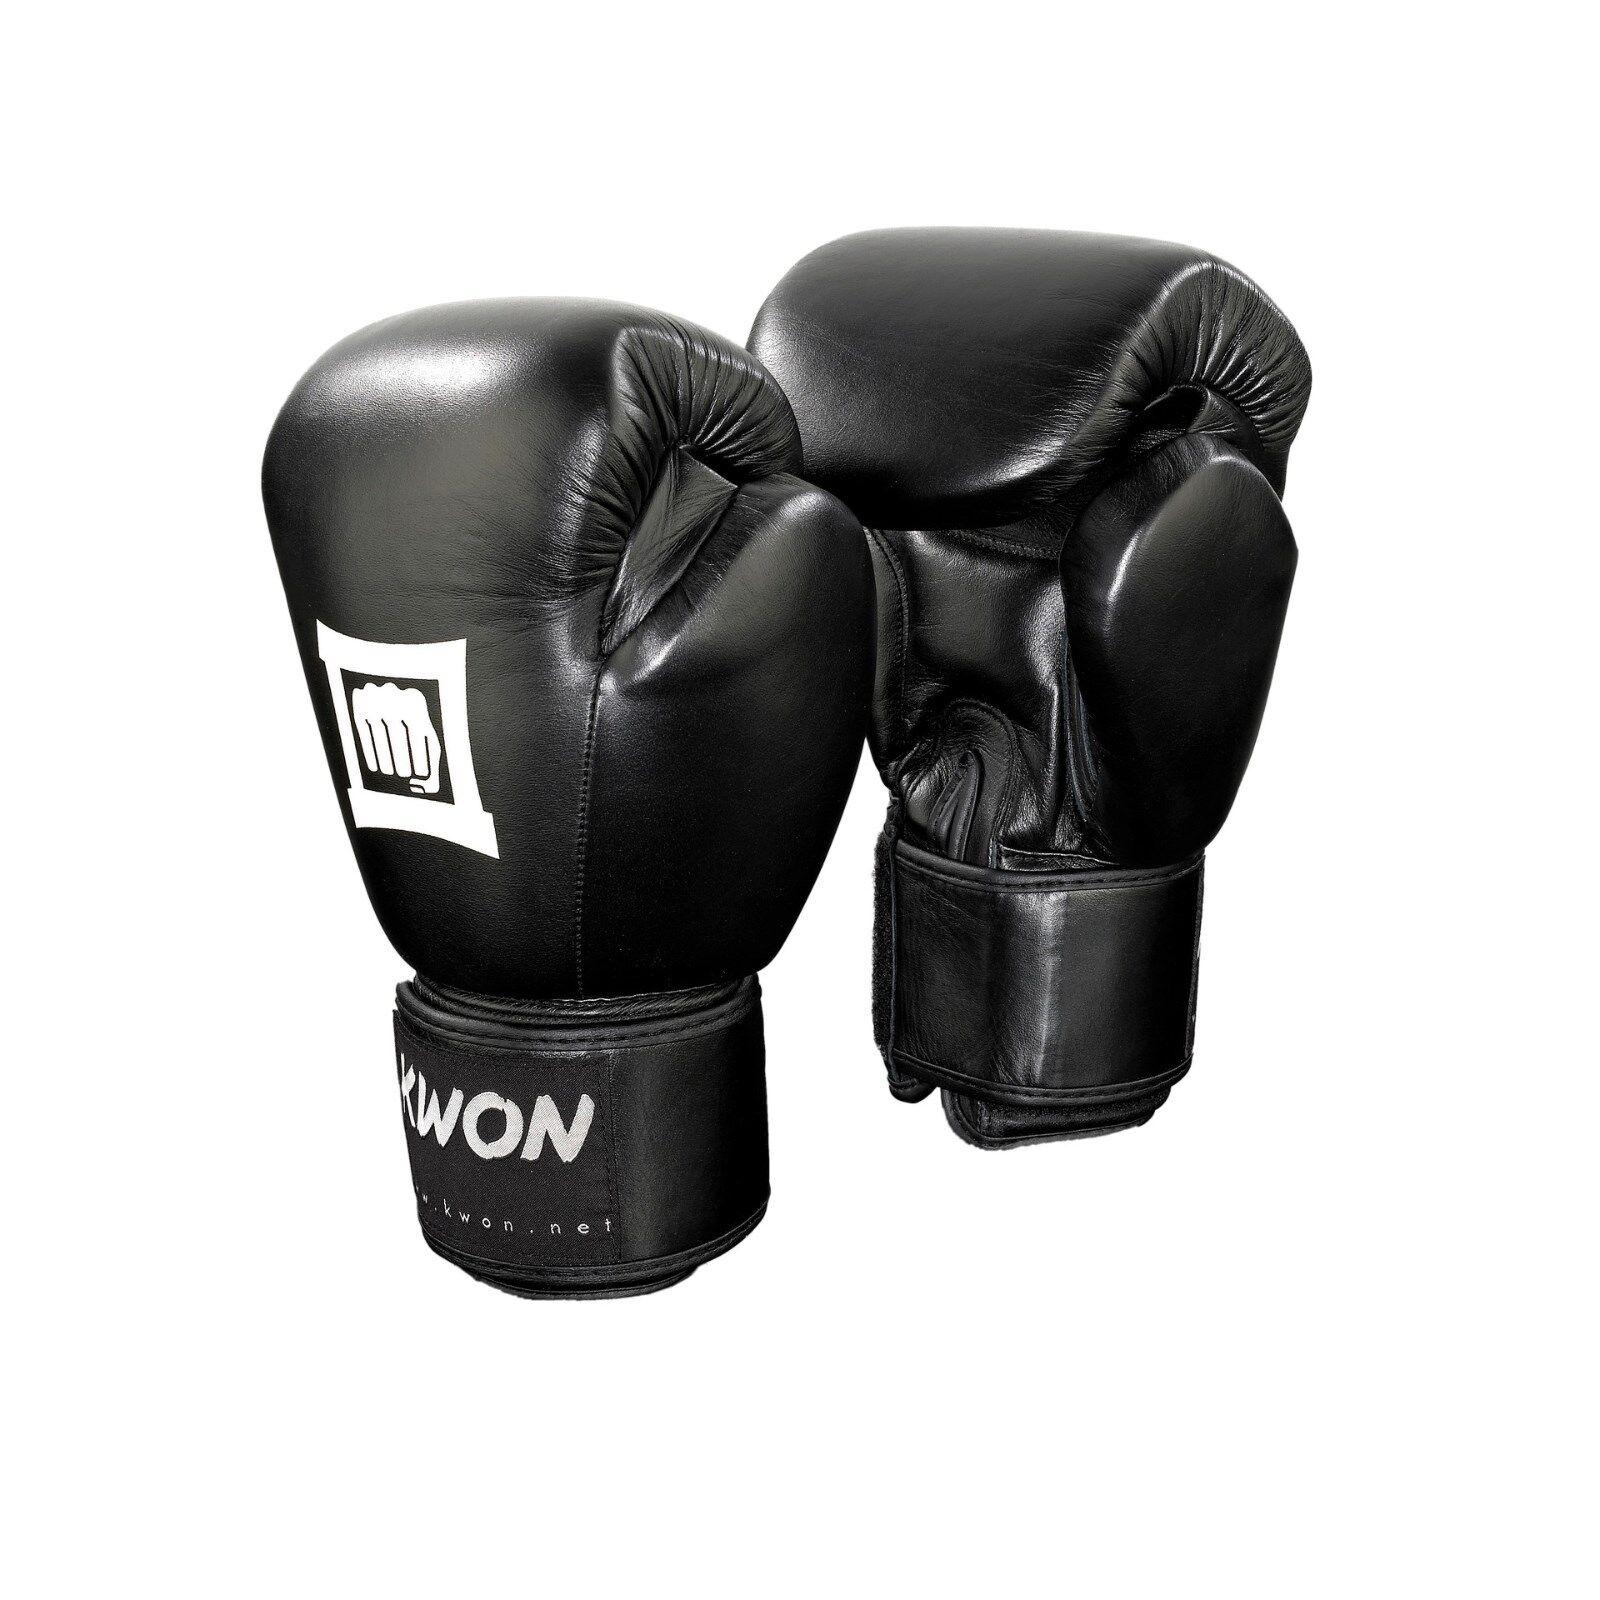 Kwon Boxhandschuhe Sparring Champ von 10-16Oz. Muay Muay Muay Thai Kickboxen MMA Boxen 056f23